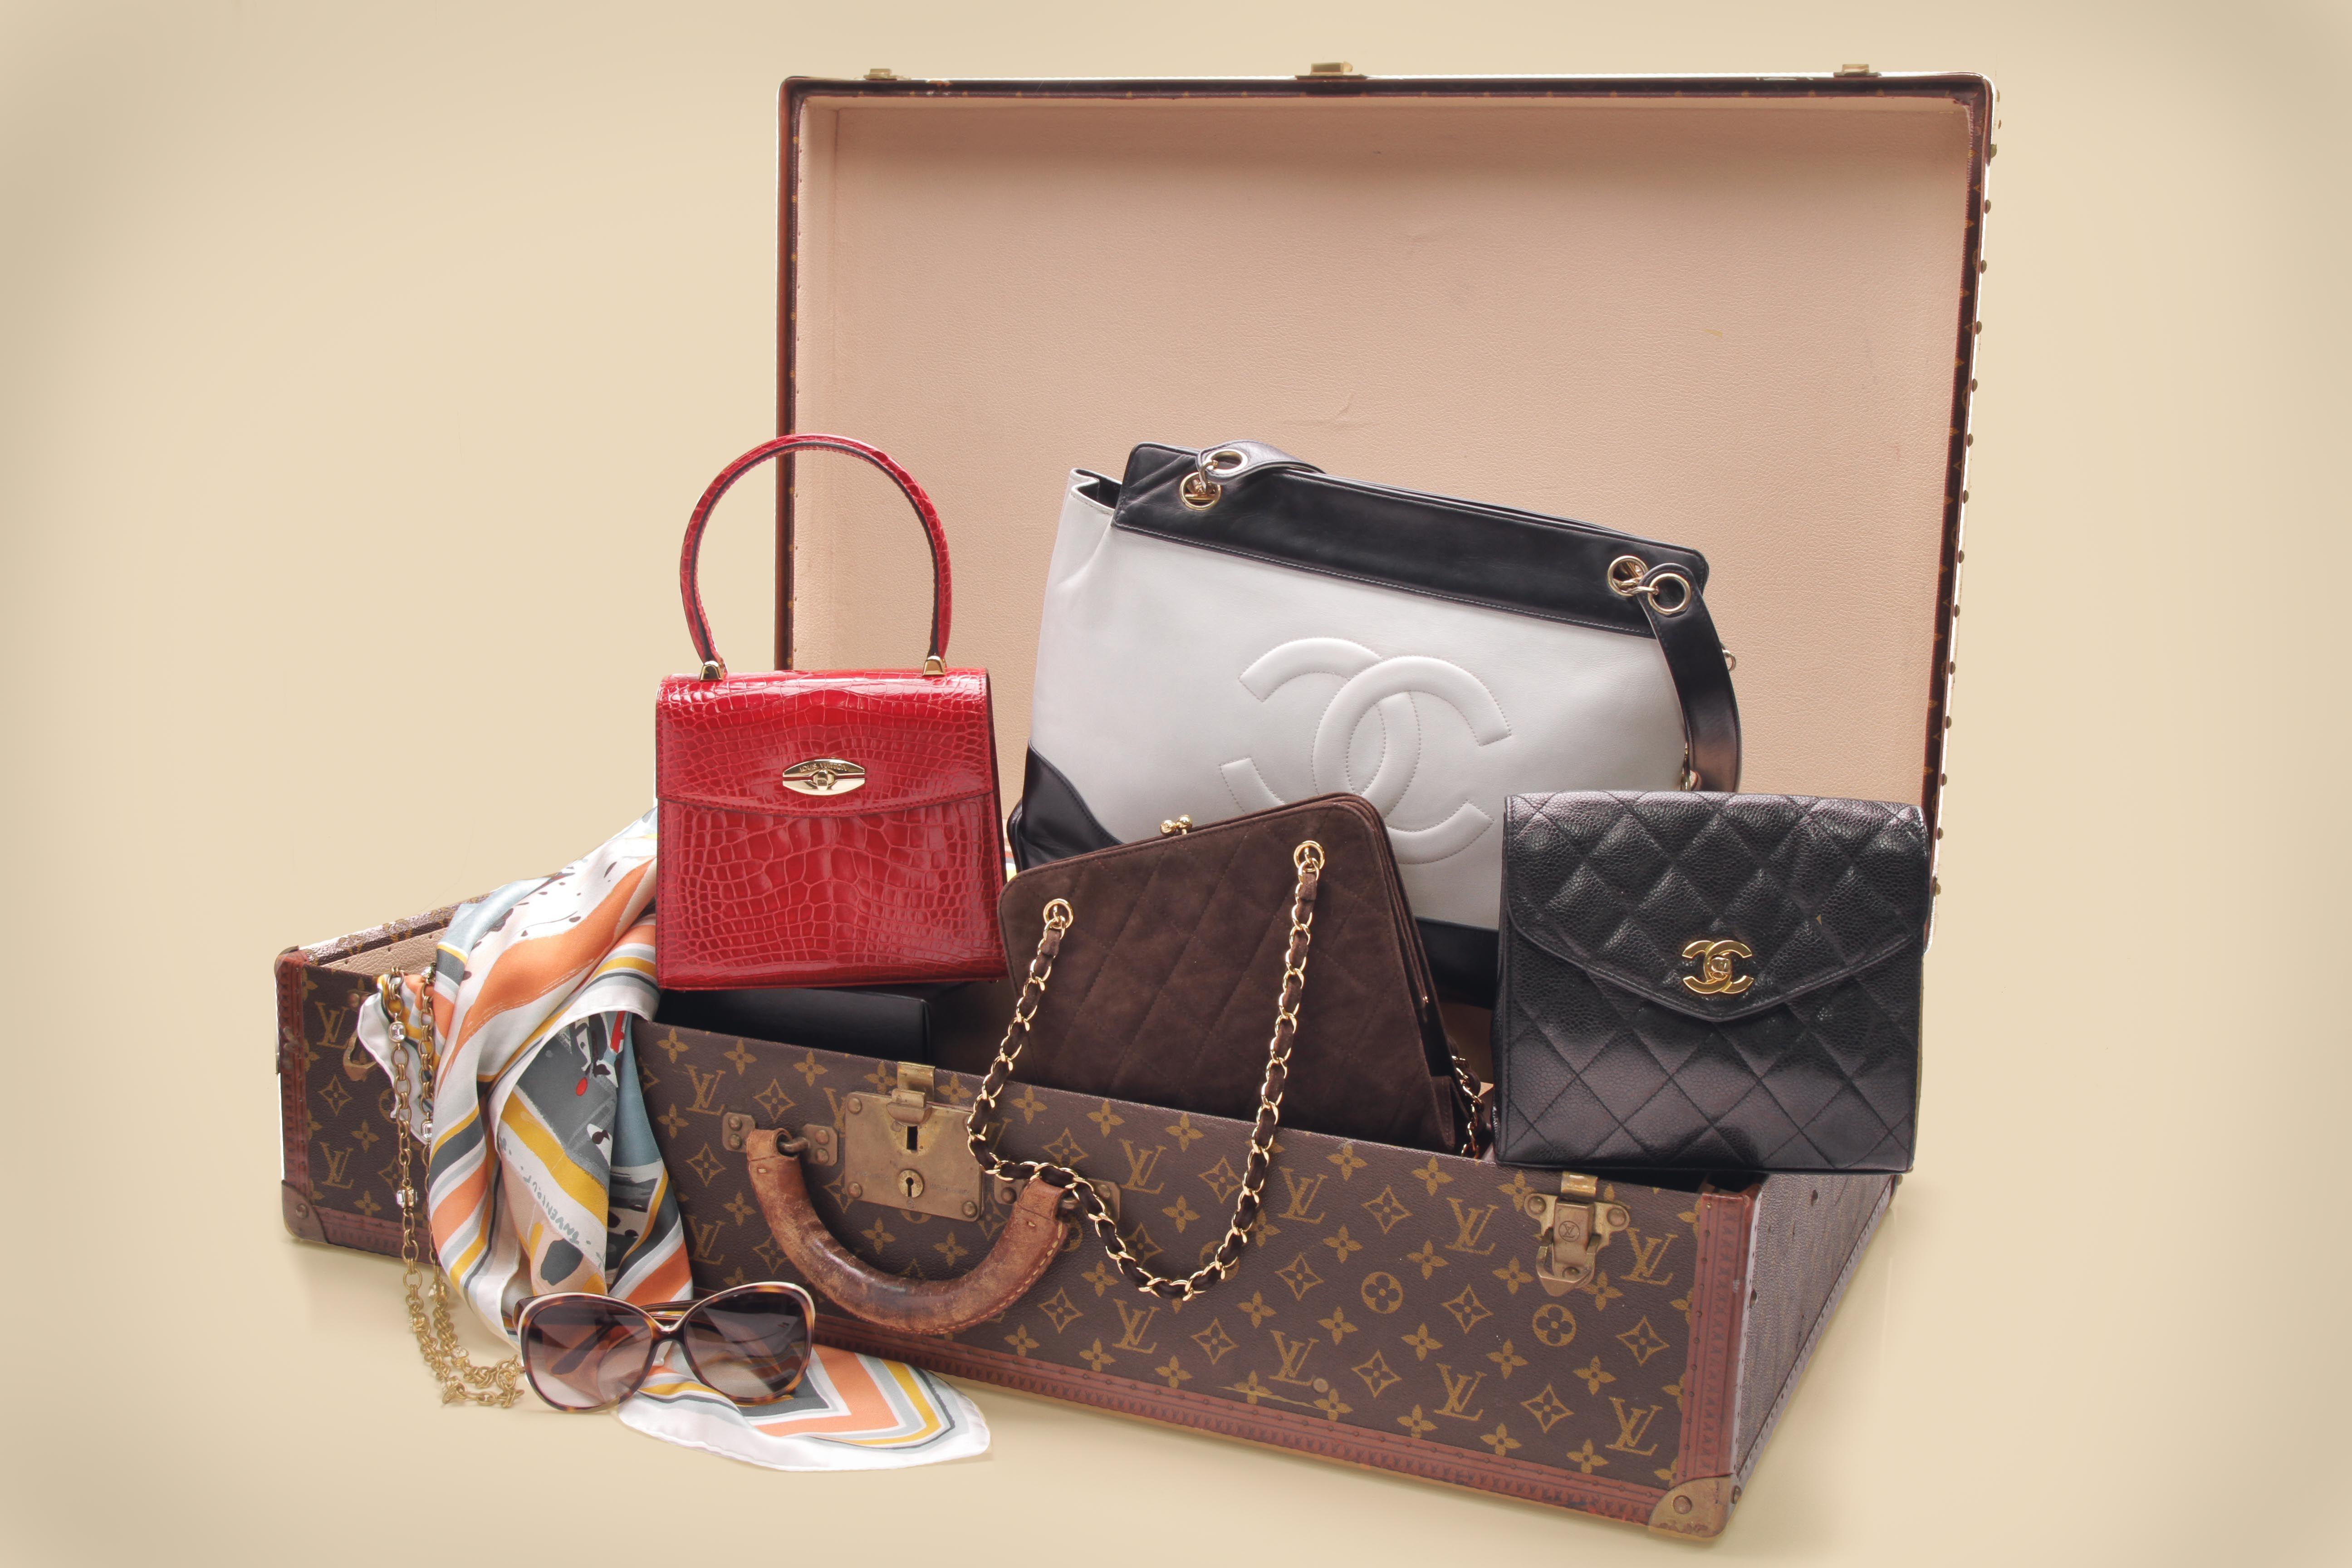 b16fa0c6f5b2 5 Tips in Buying Your First Vintage Luxury Handbag